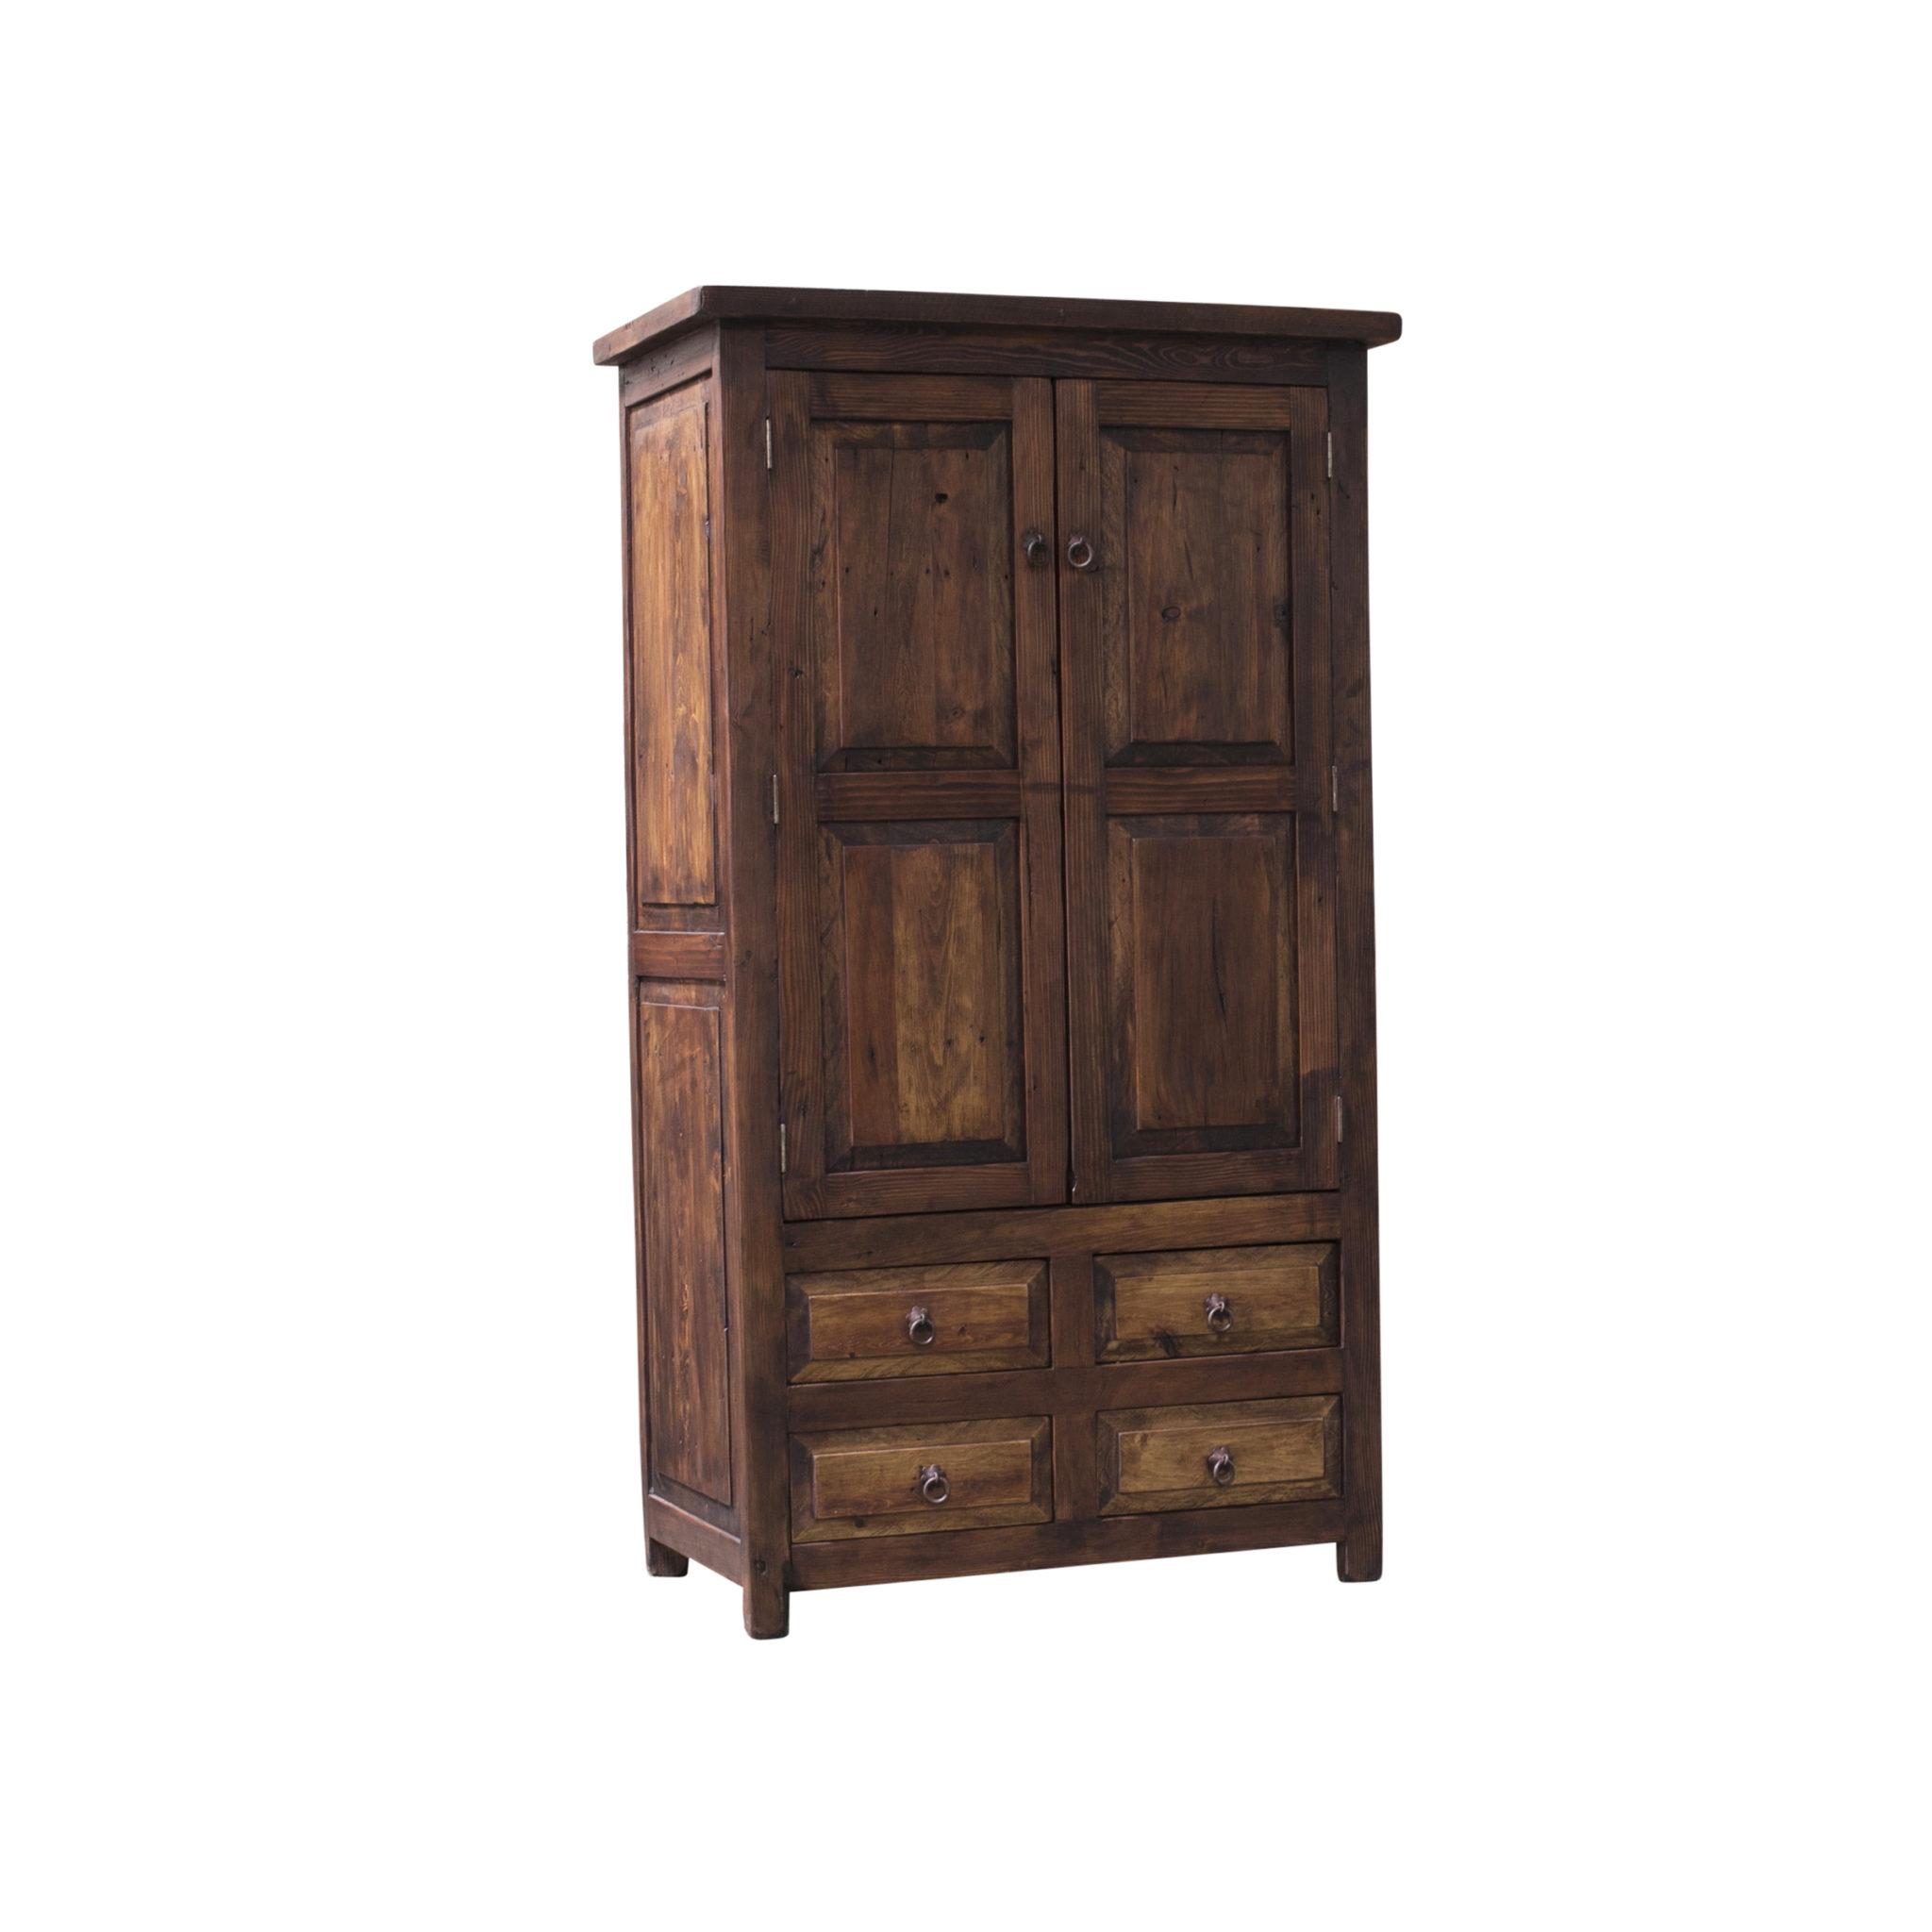 Linen Kitchen Cabinets: Hemingway Grand Rustic Linen Cabinet